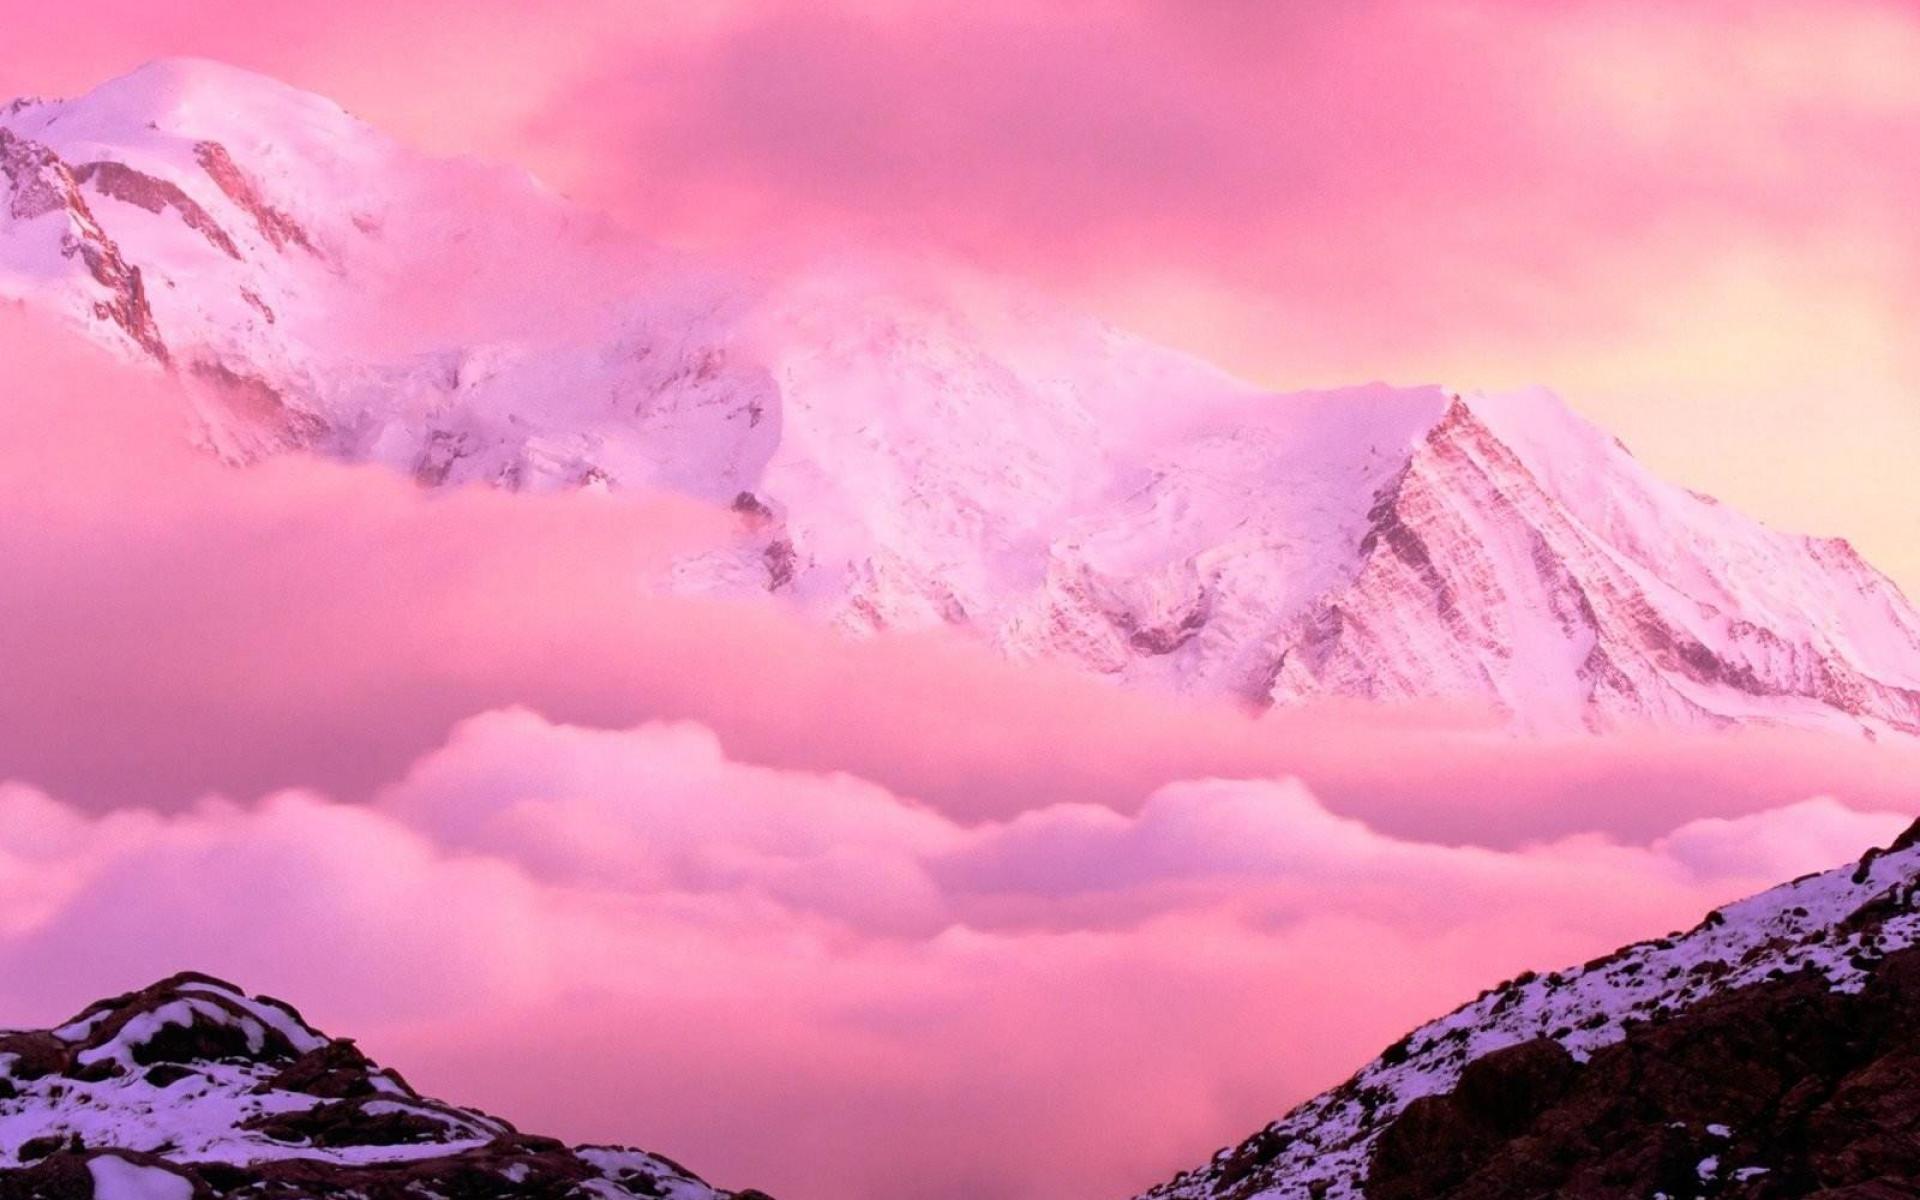 Pink 1900x1200   Wallpaper High Definition High Quality Widescreen 1920x1200